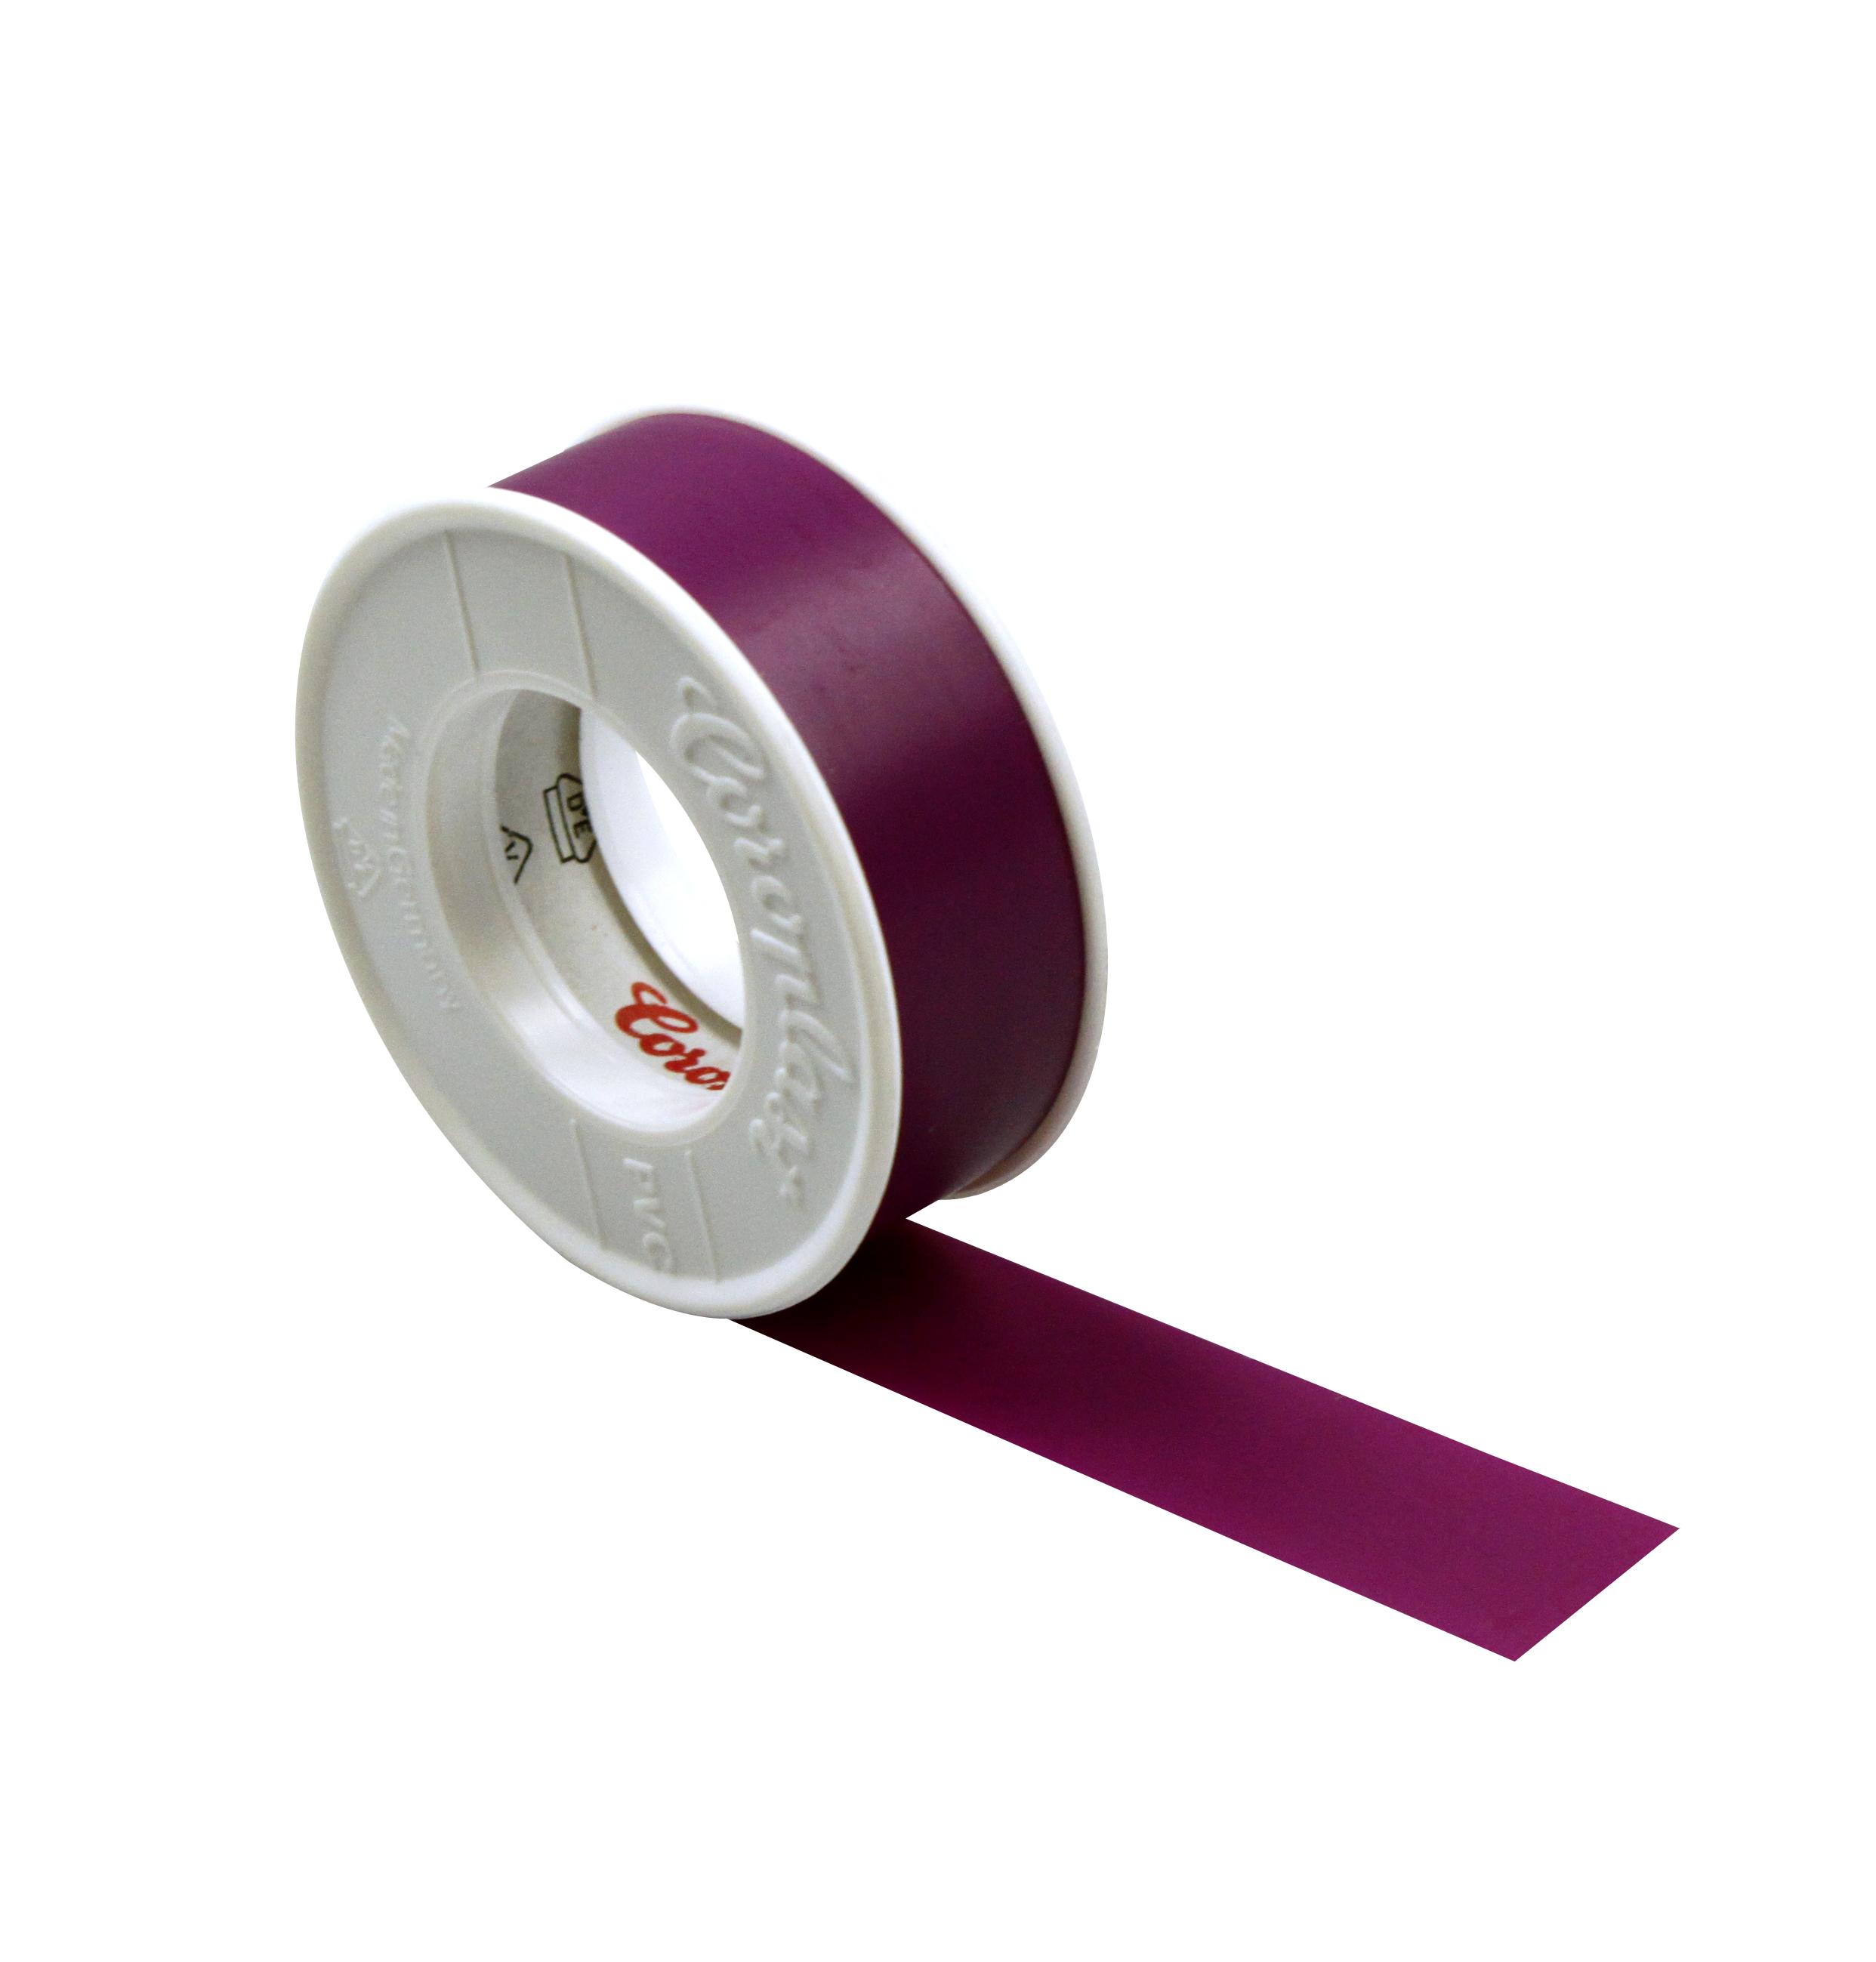 1 Stk Isolierband violett 15mm x 10m-Coroplast GI98510902